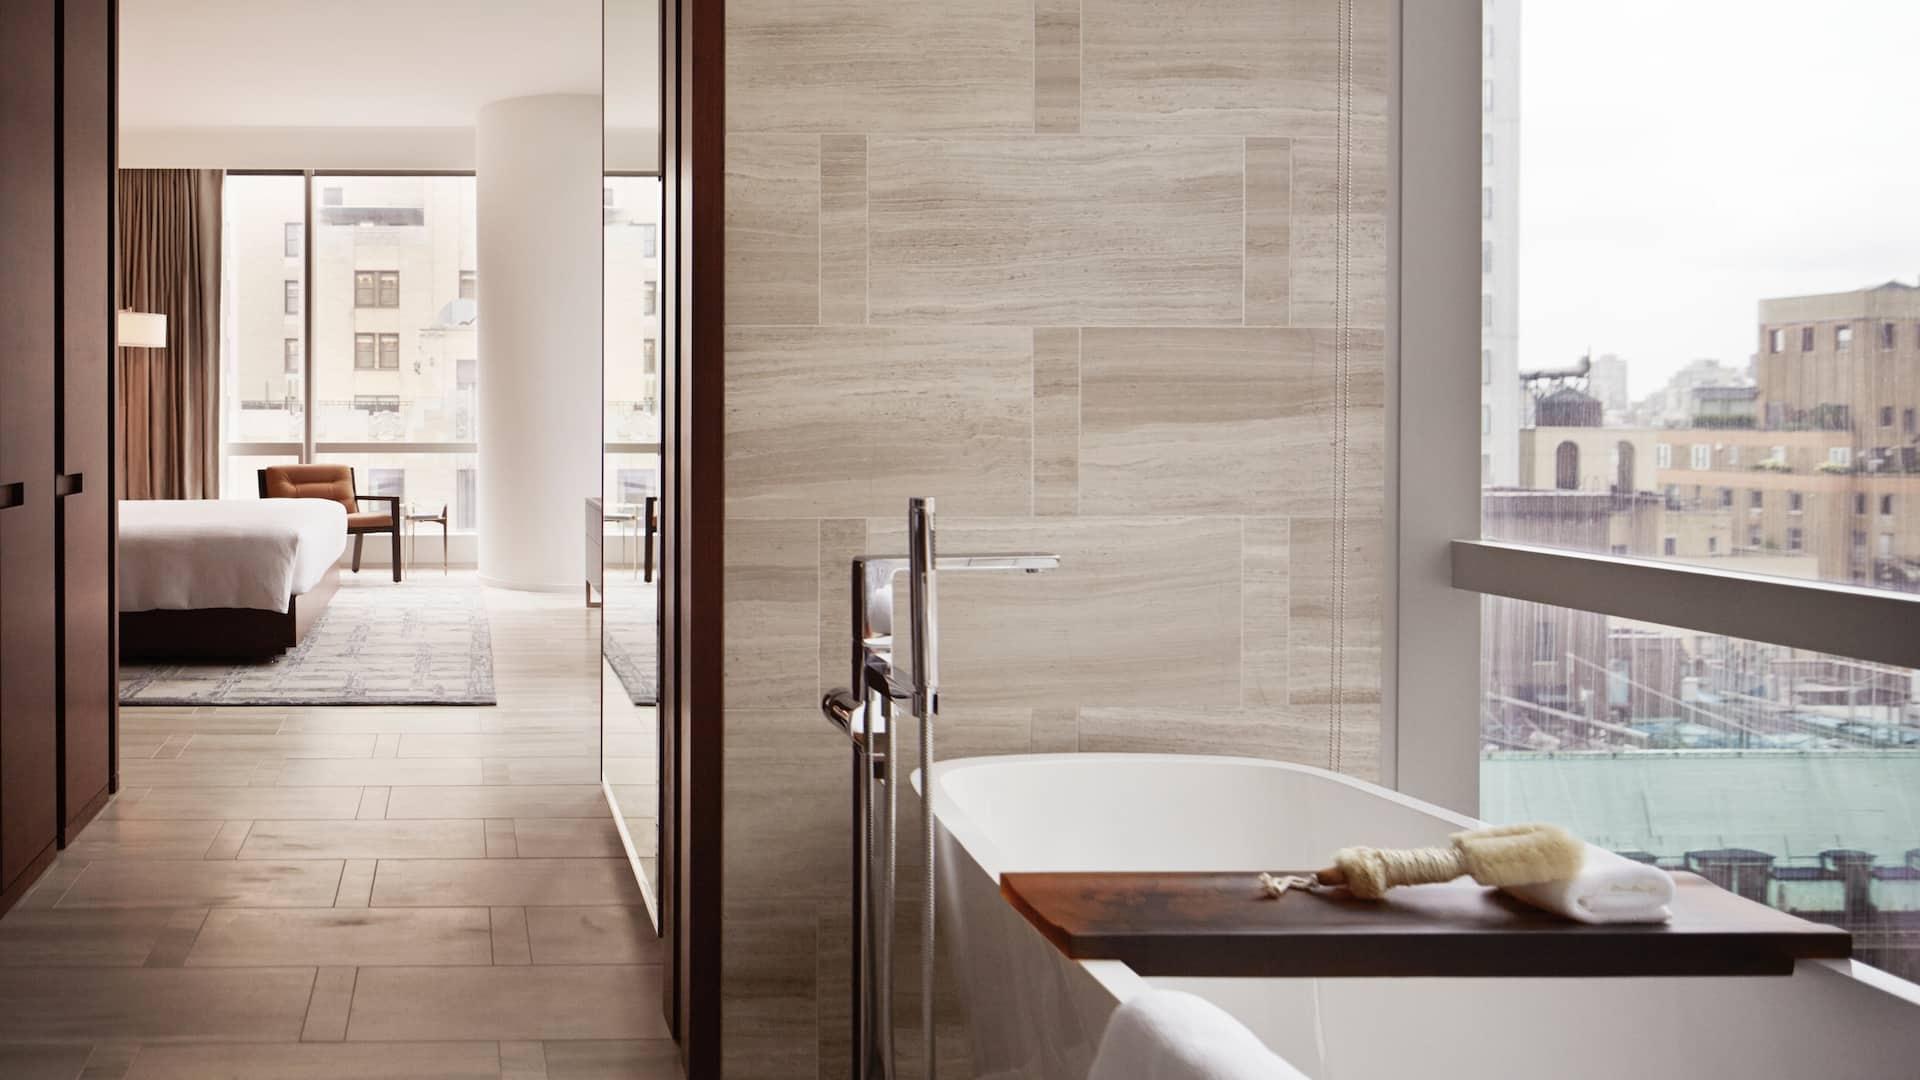 City View Suite Bathroom